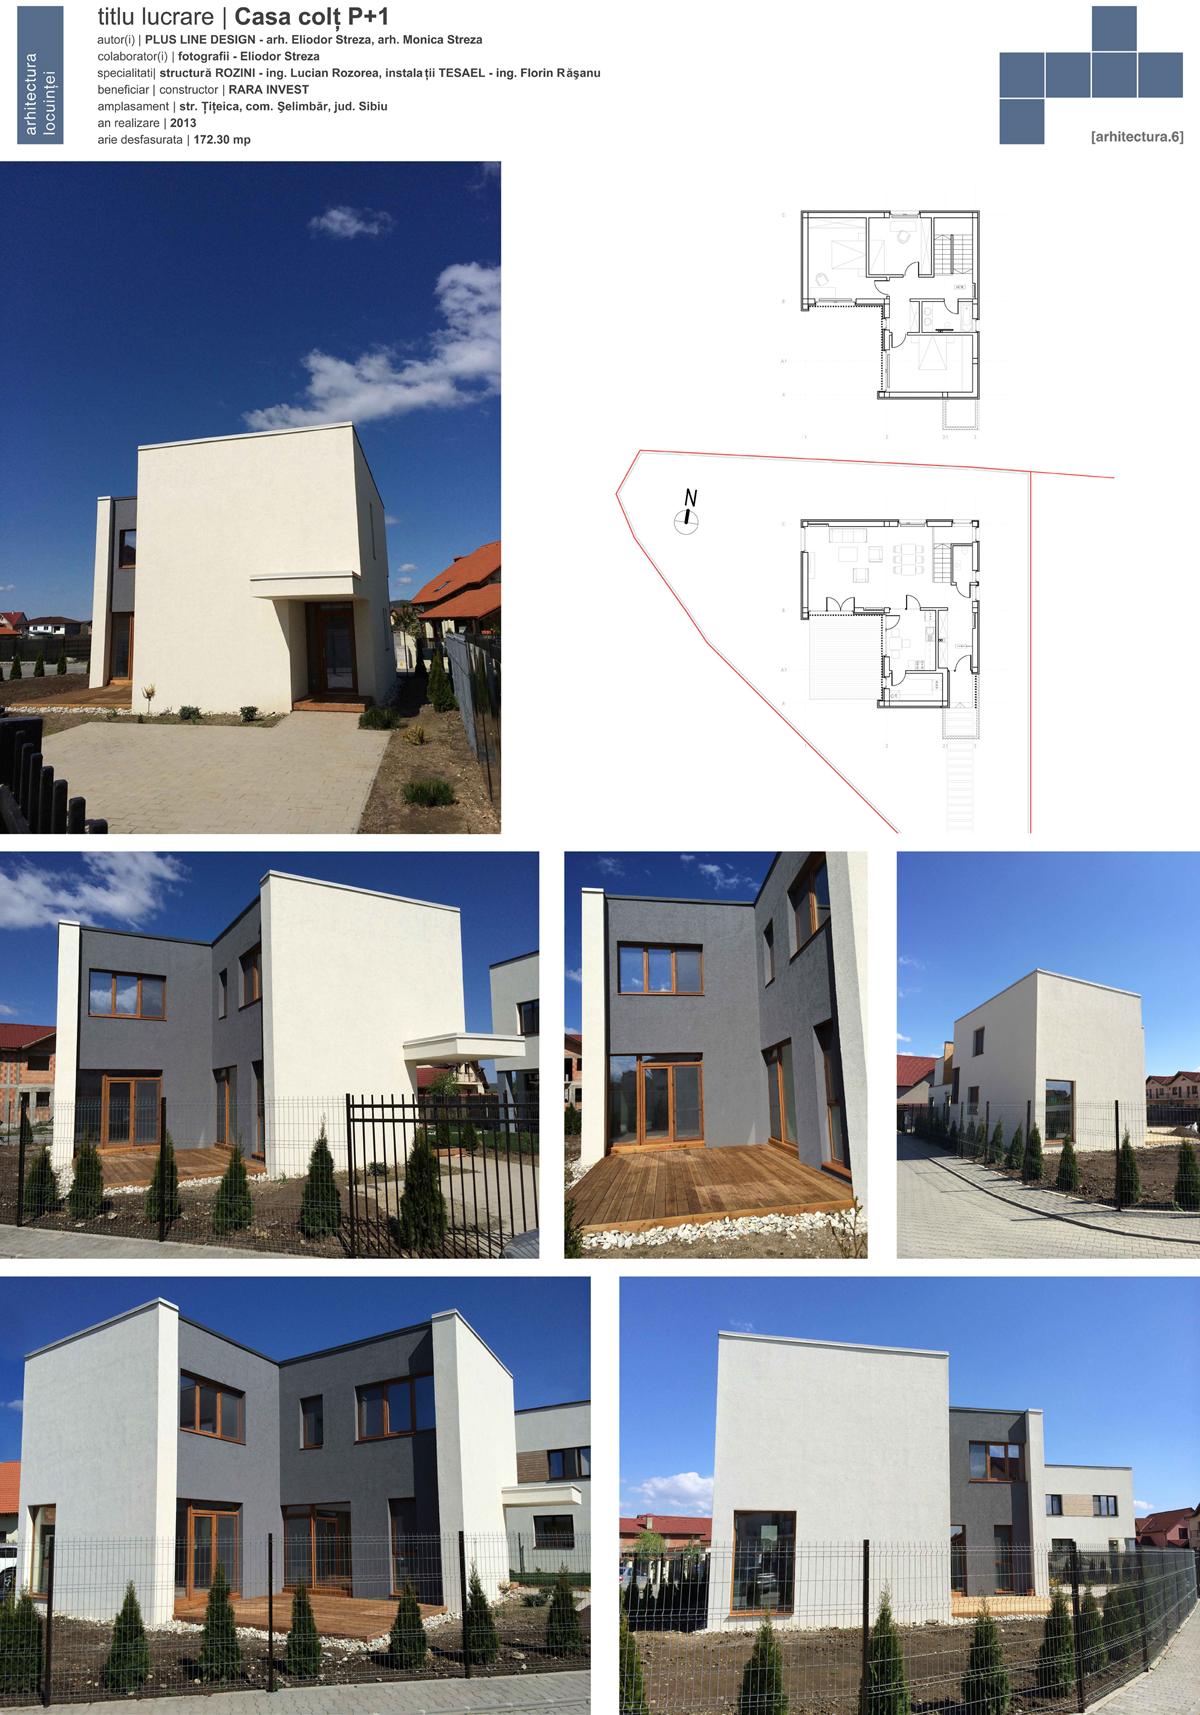 PlusLineDesign - Locuinte Casa colt P+1